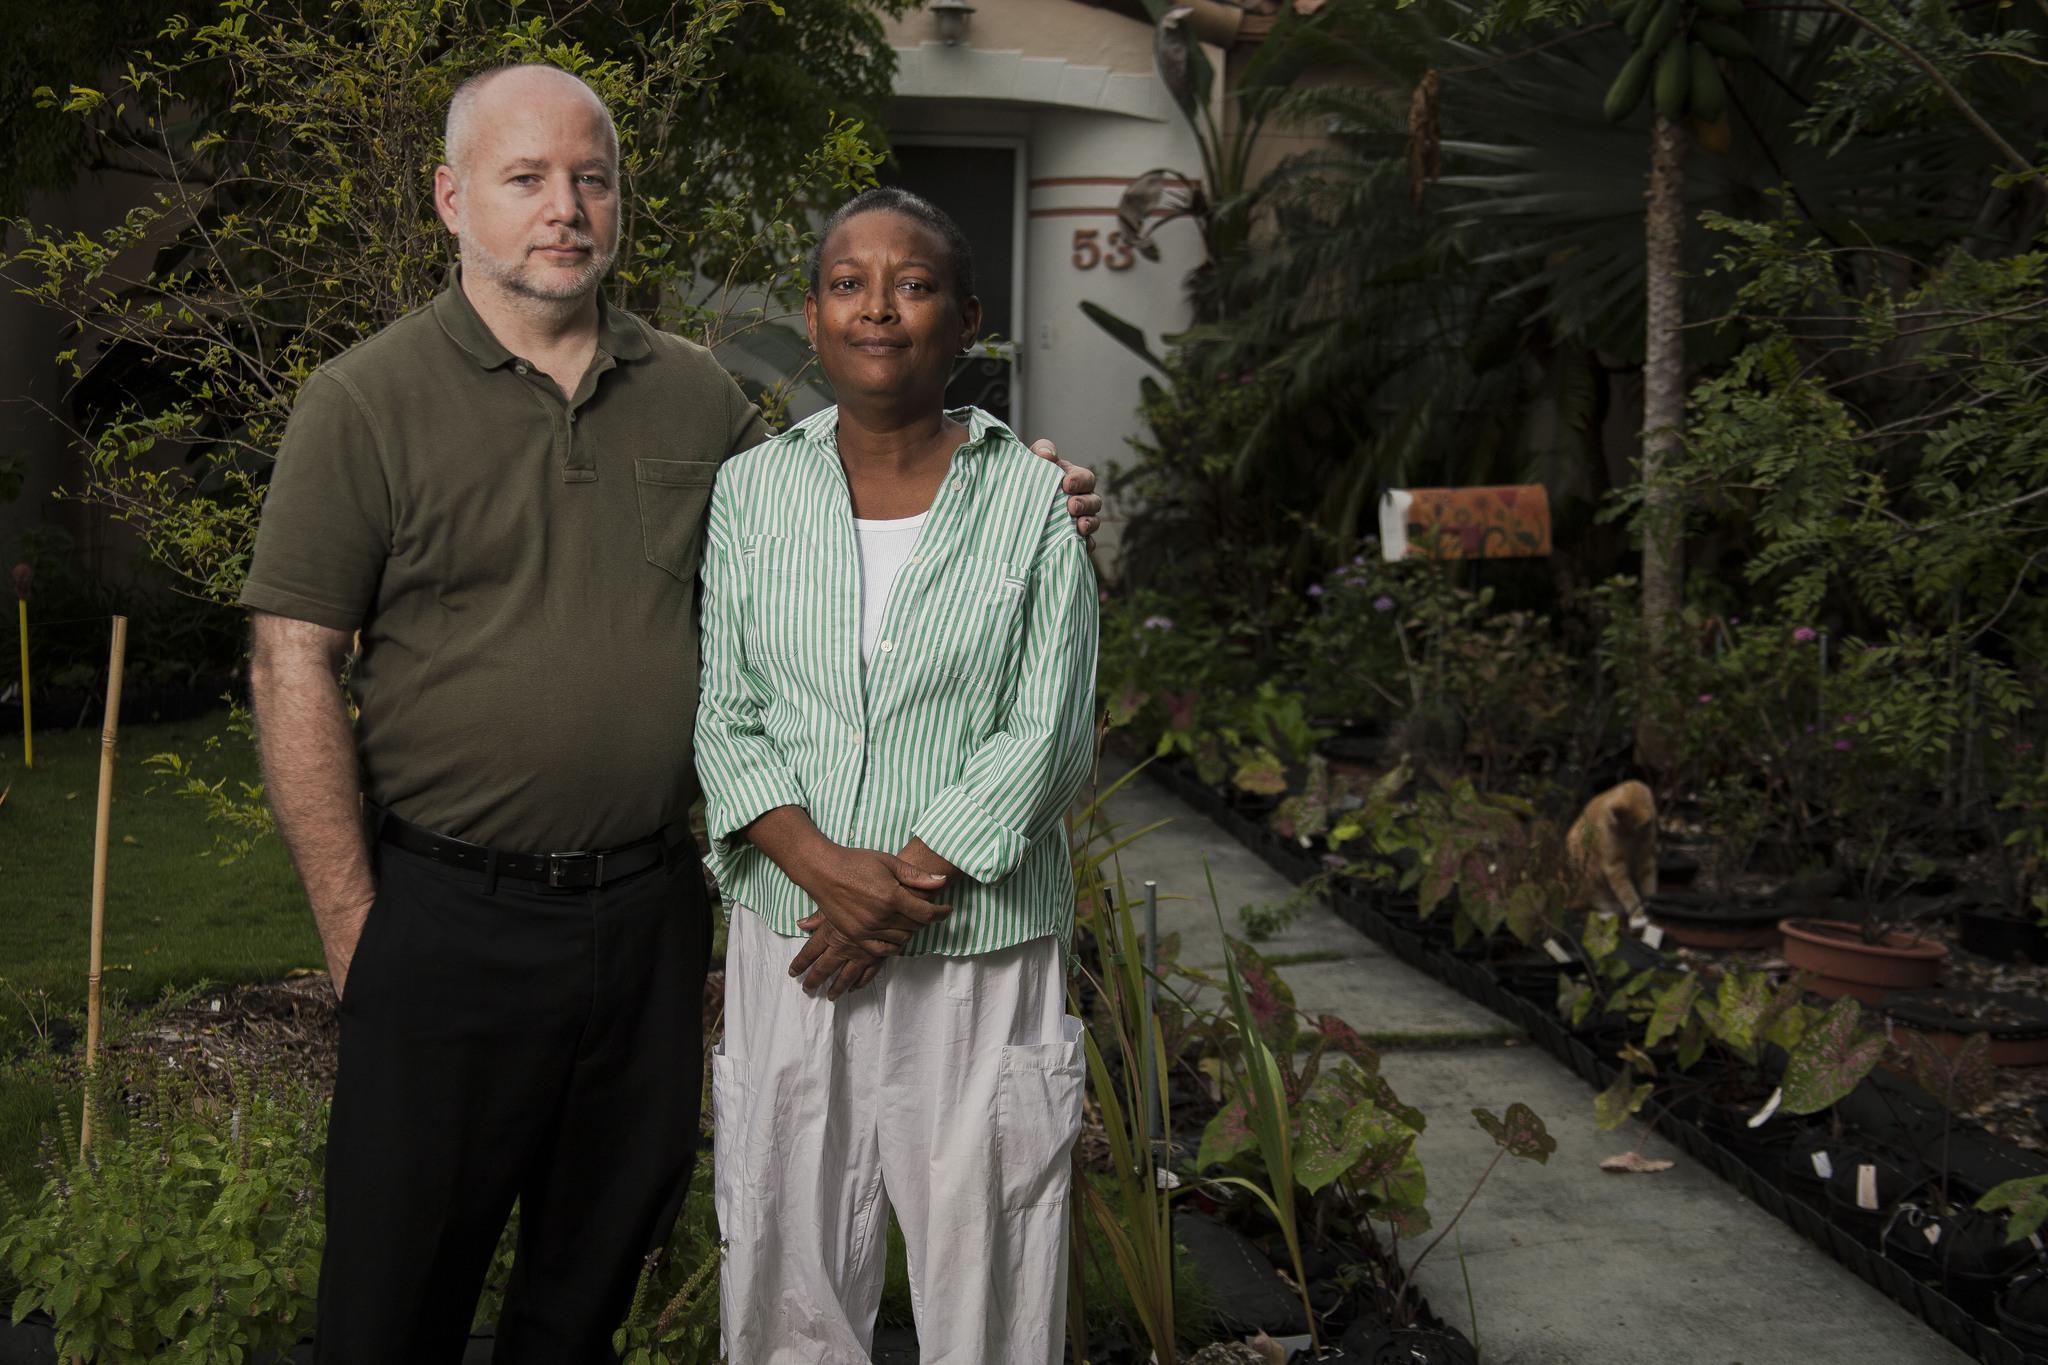 Florida Vegetable Gardens Institute For Justice